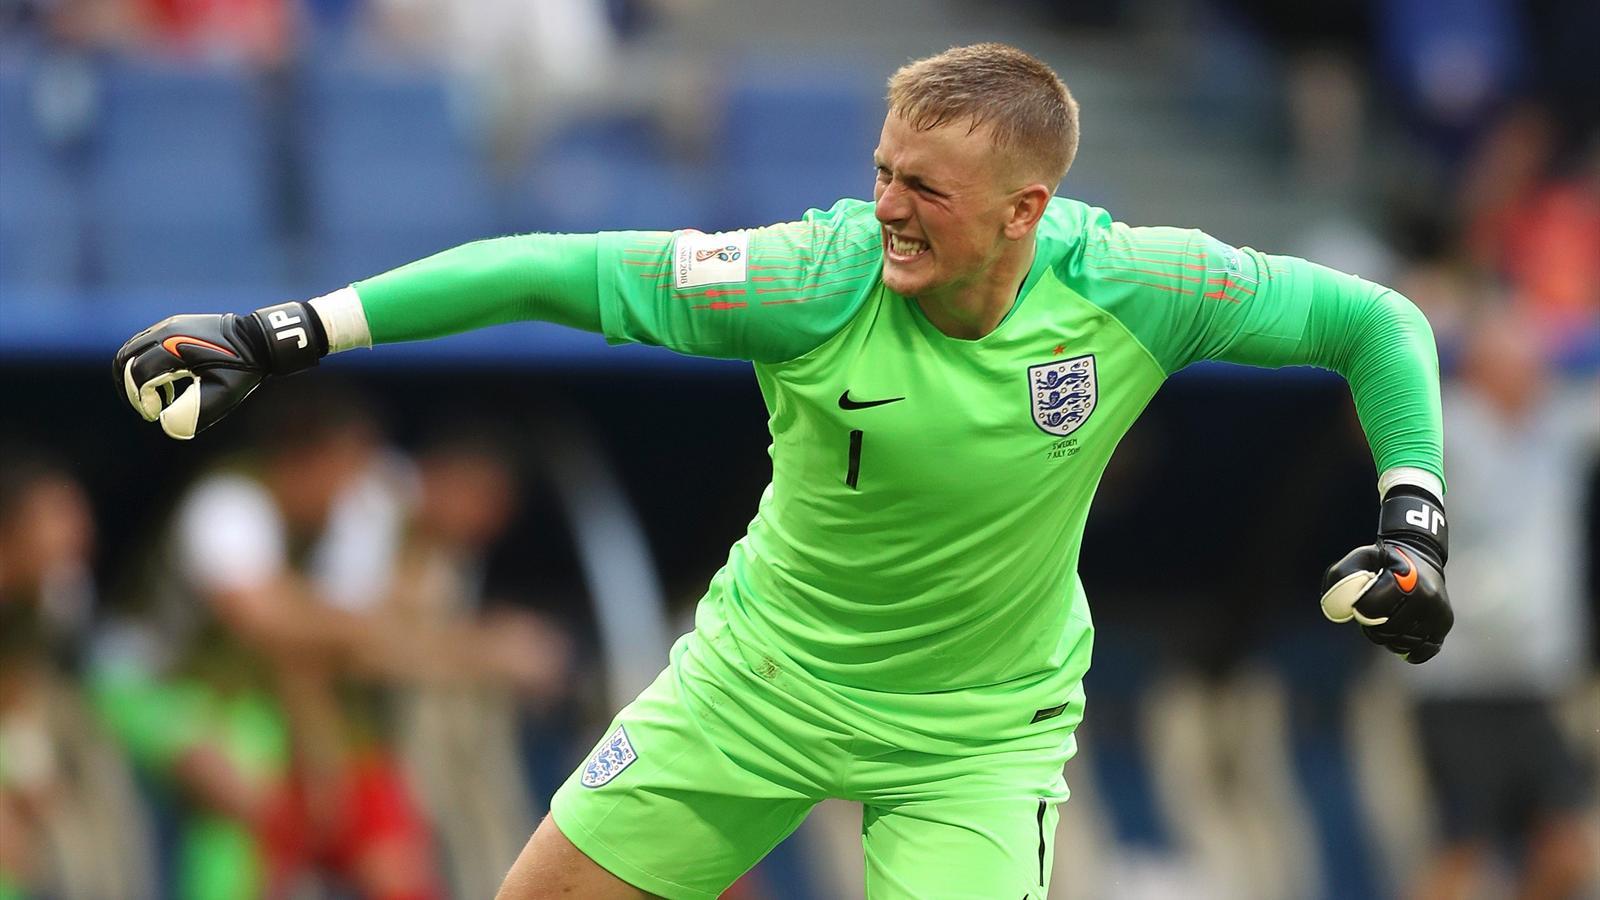 World Cup 2018 Semi-final: Why Jordan Pickford Is Breaking